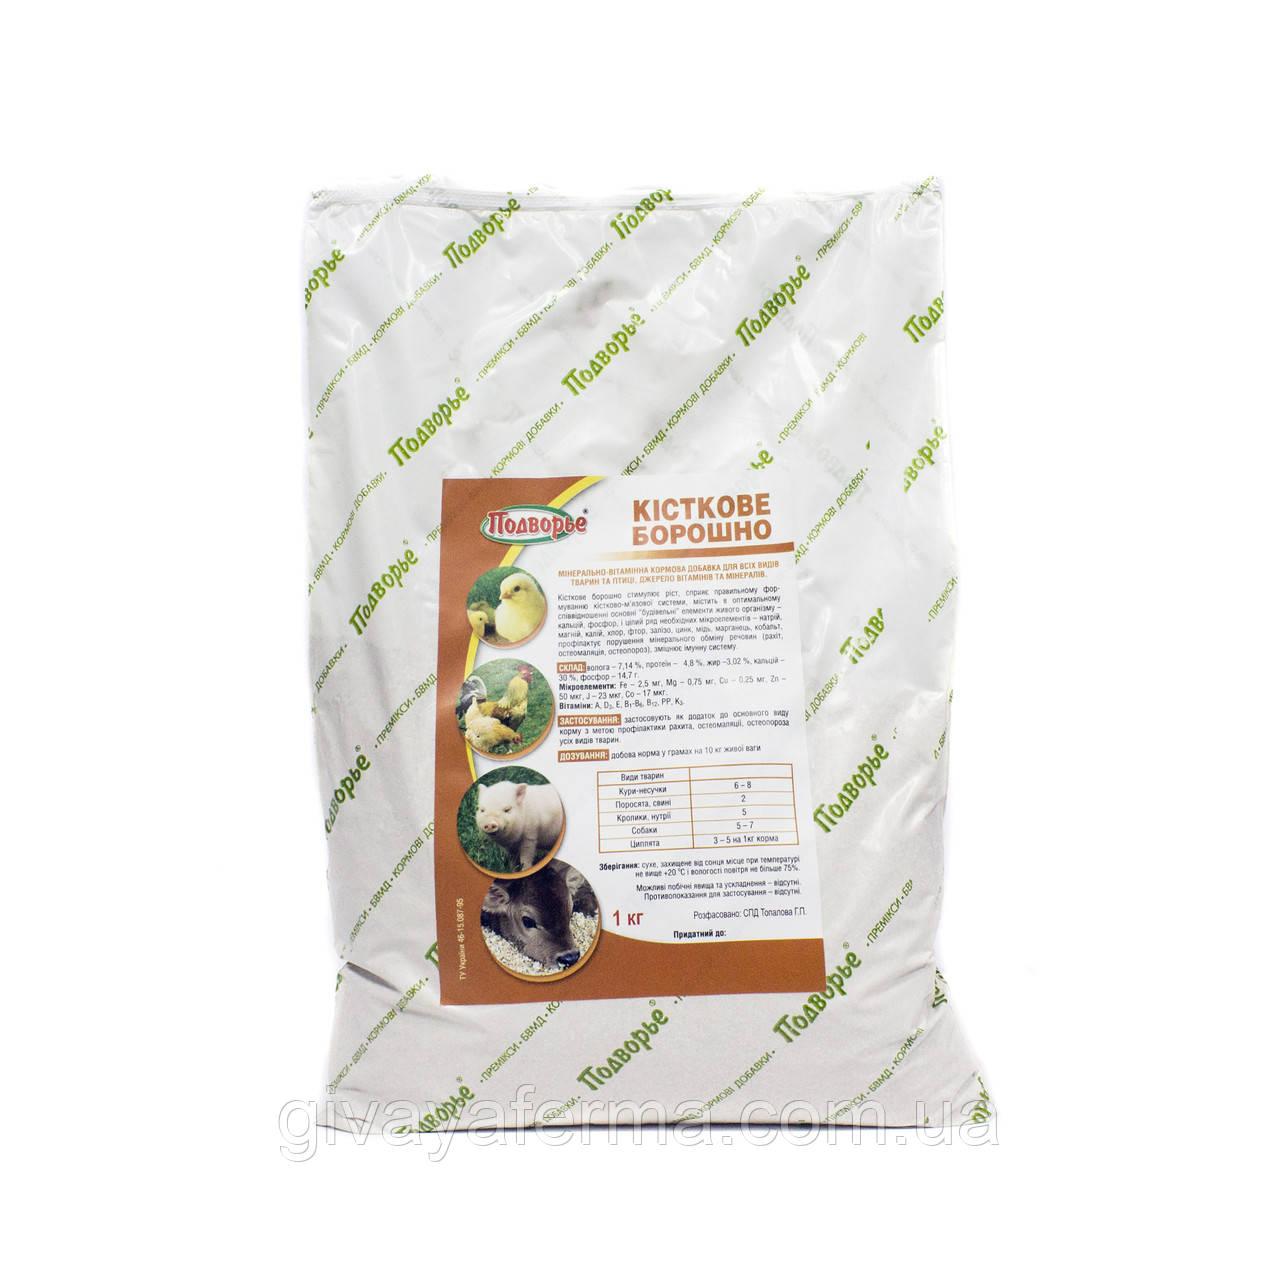 Мука костная 1 кг белково-витаминная кормовая добавка